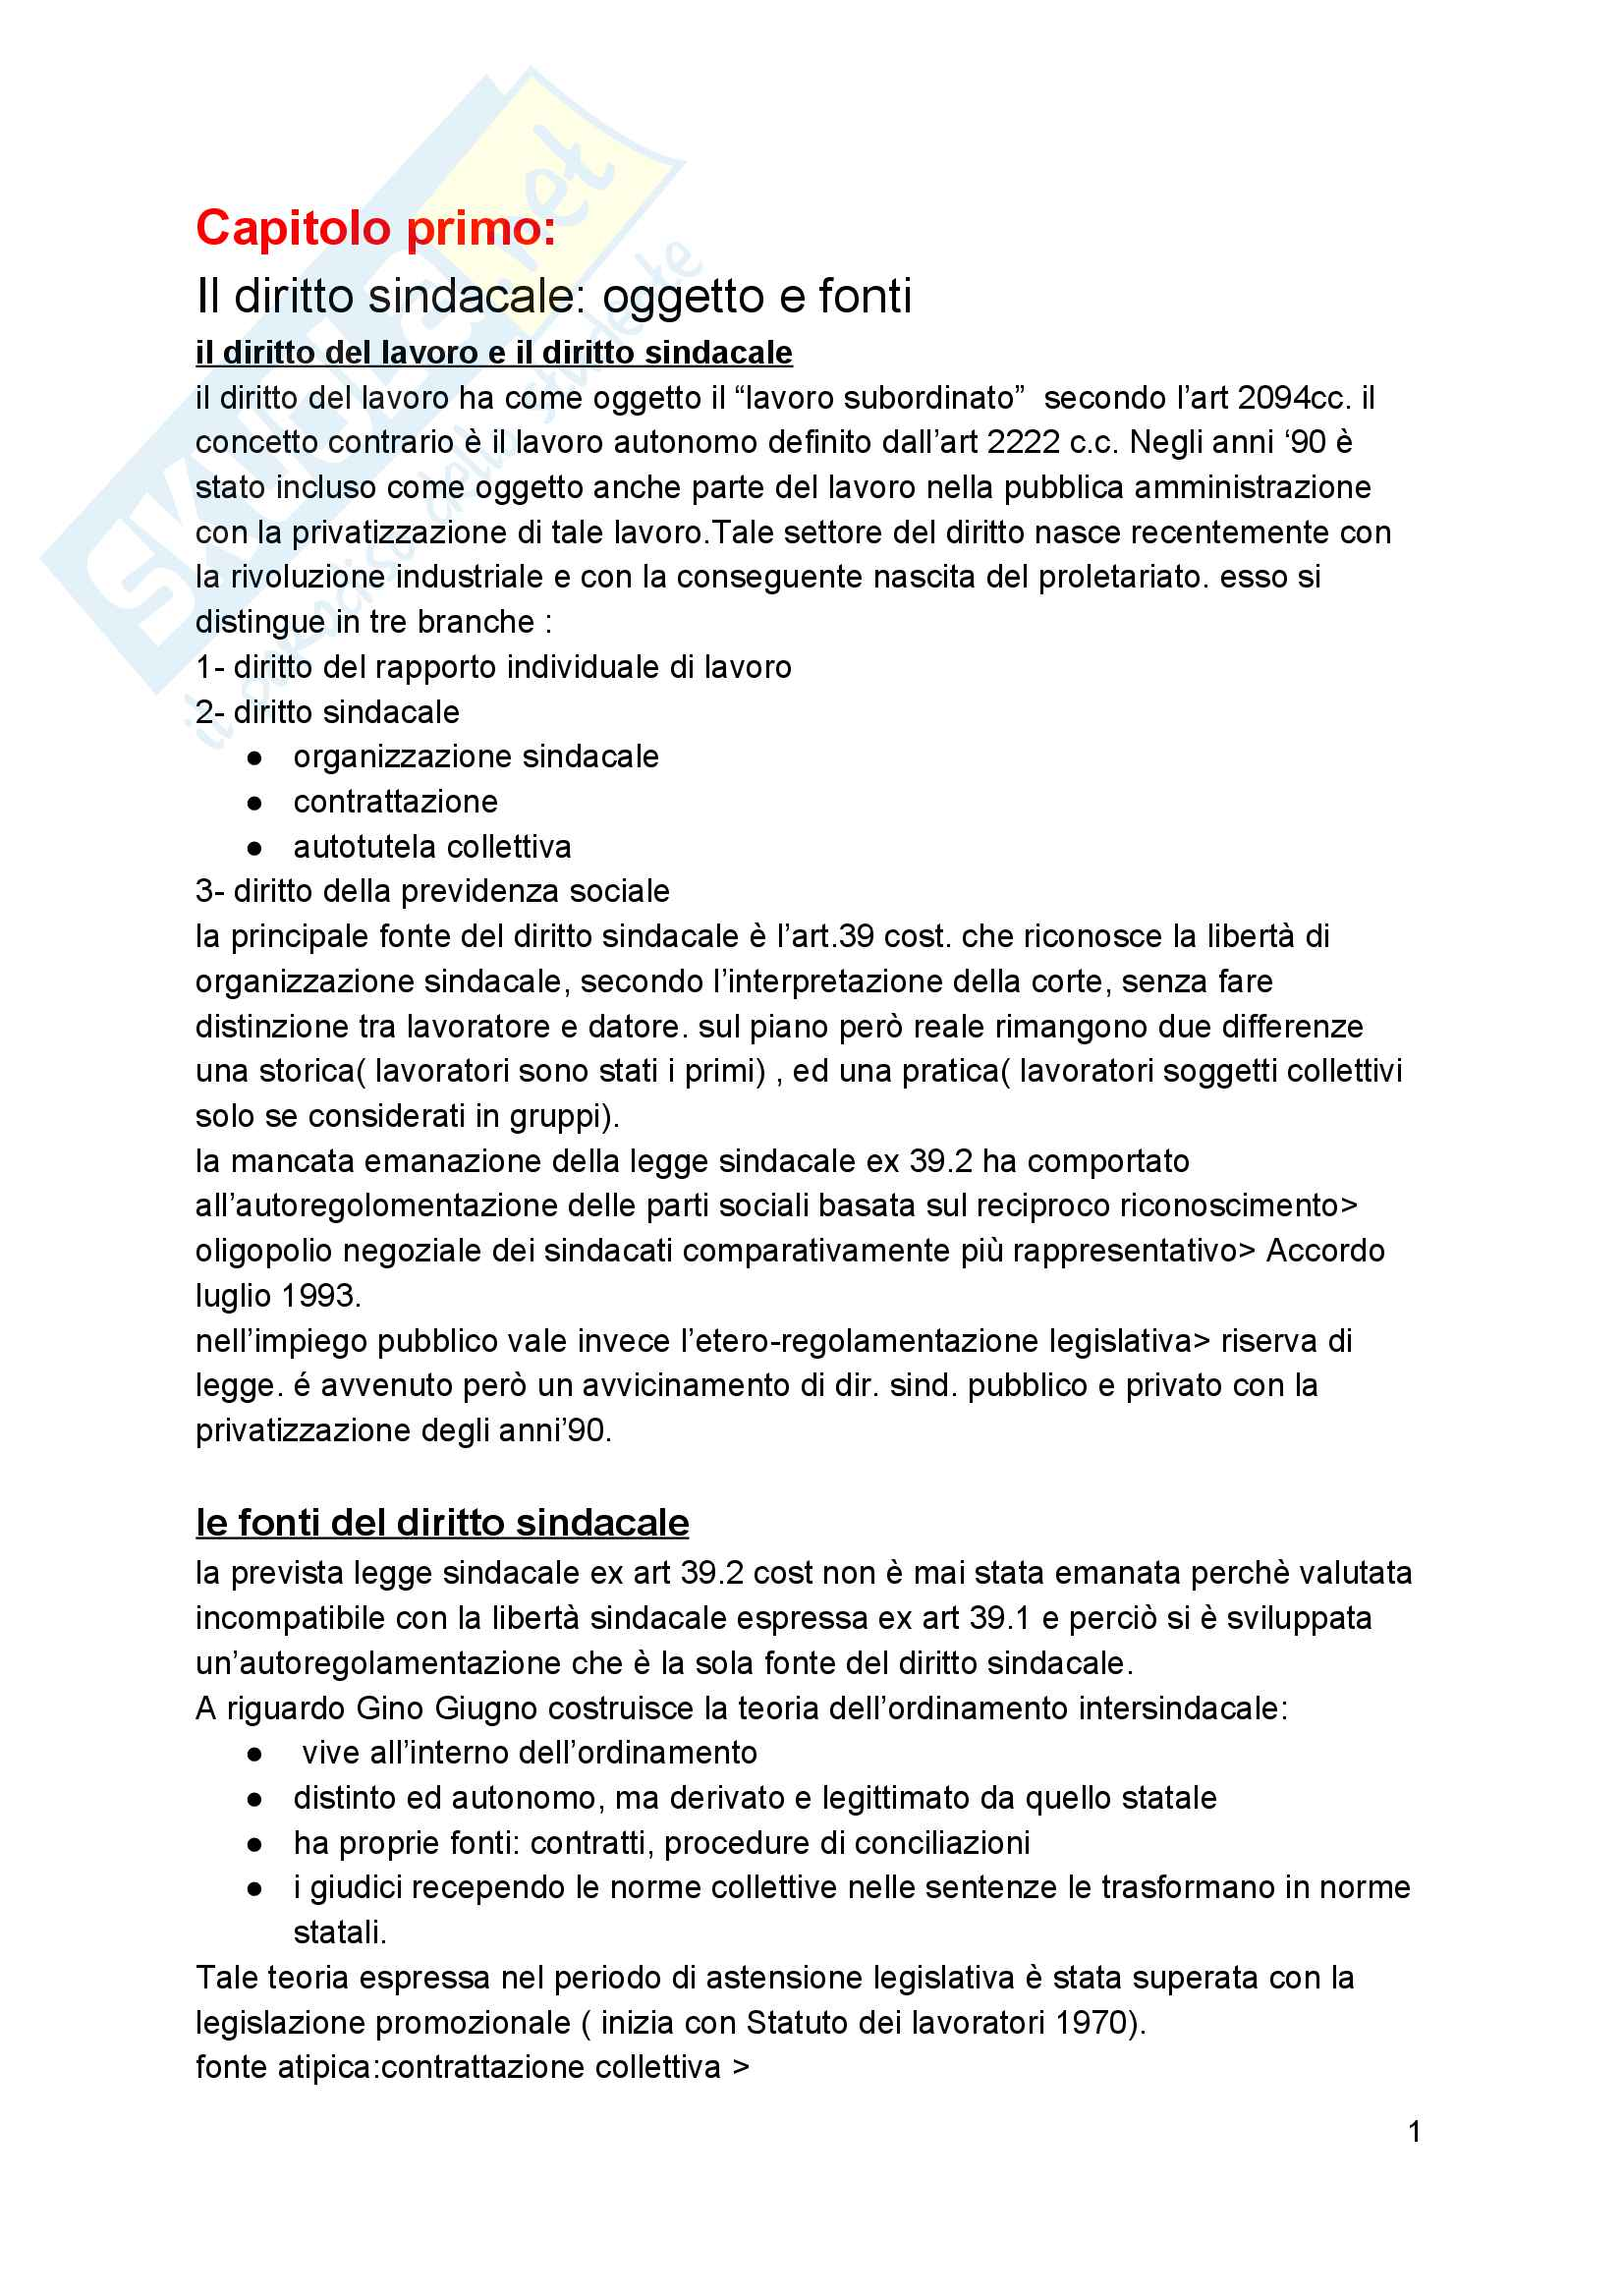 Riassunto esame diritto sindacale, docente Sandro Mainardi